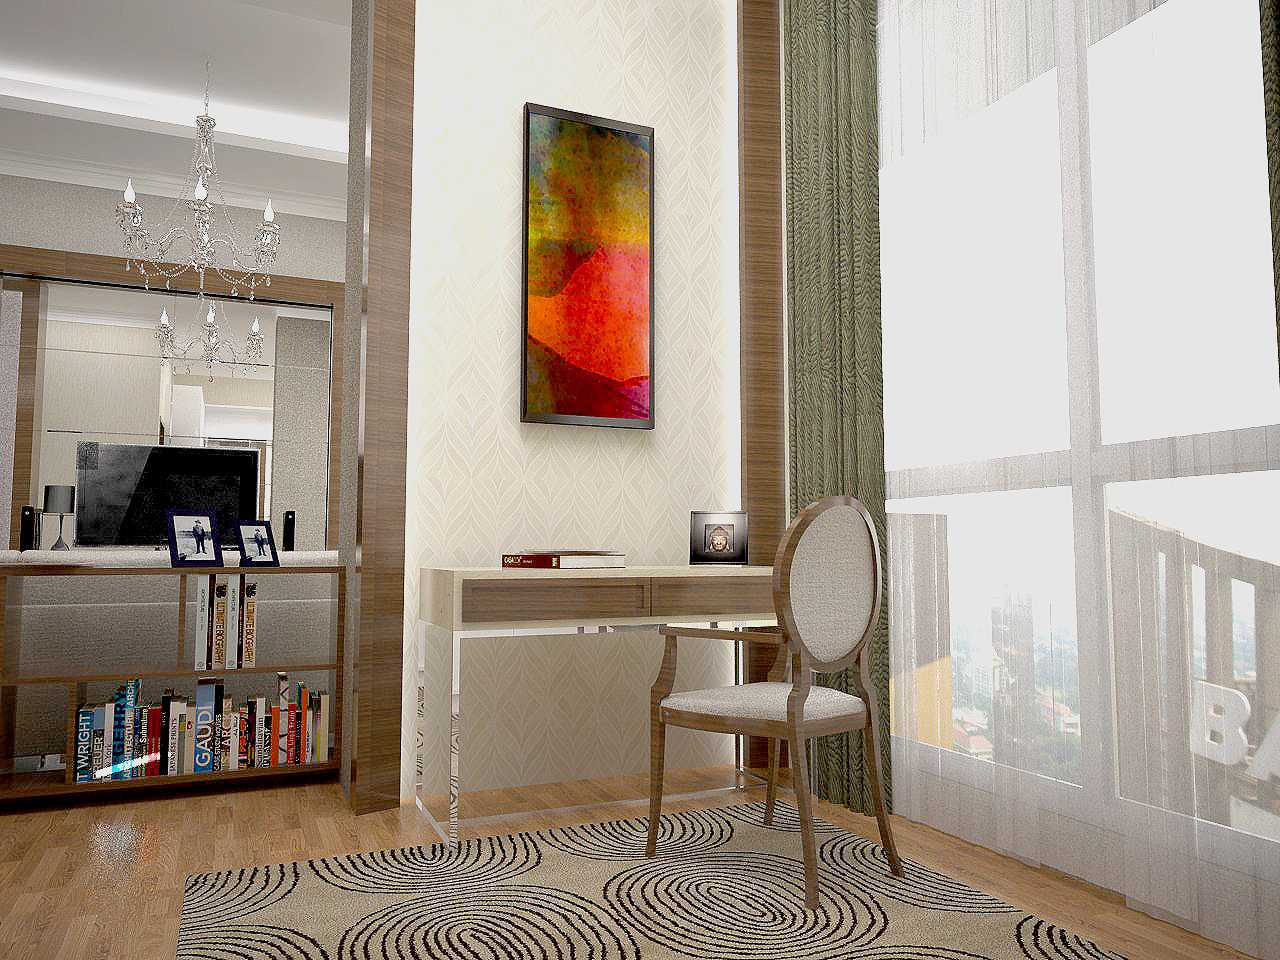 Pt. Garisprada Residences 8 Apartment Residence 8, Senopati, Jakarta Residence 8, Senopati, Jakarta Studio Modern 25489